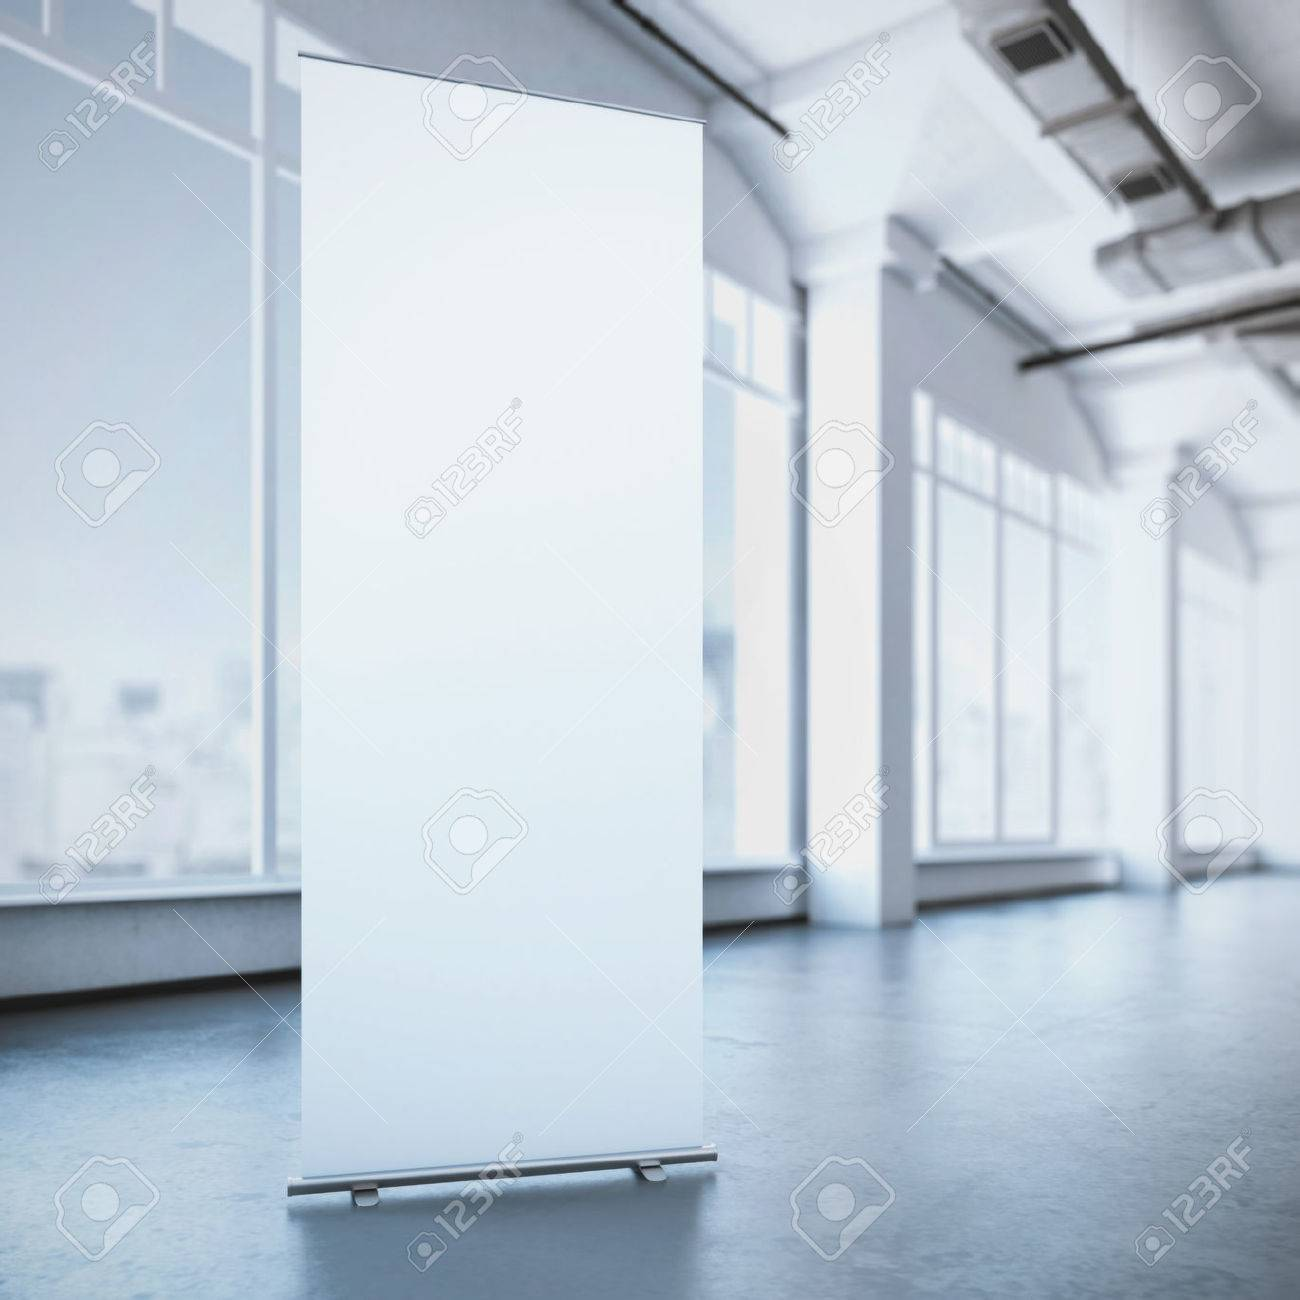 White roll up banner in a modern loft interior. 3d rendering - 47062949